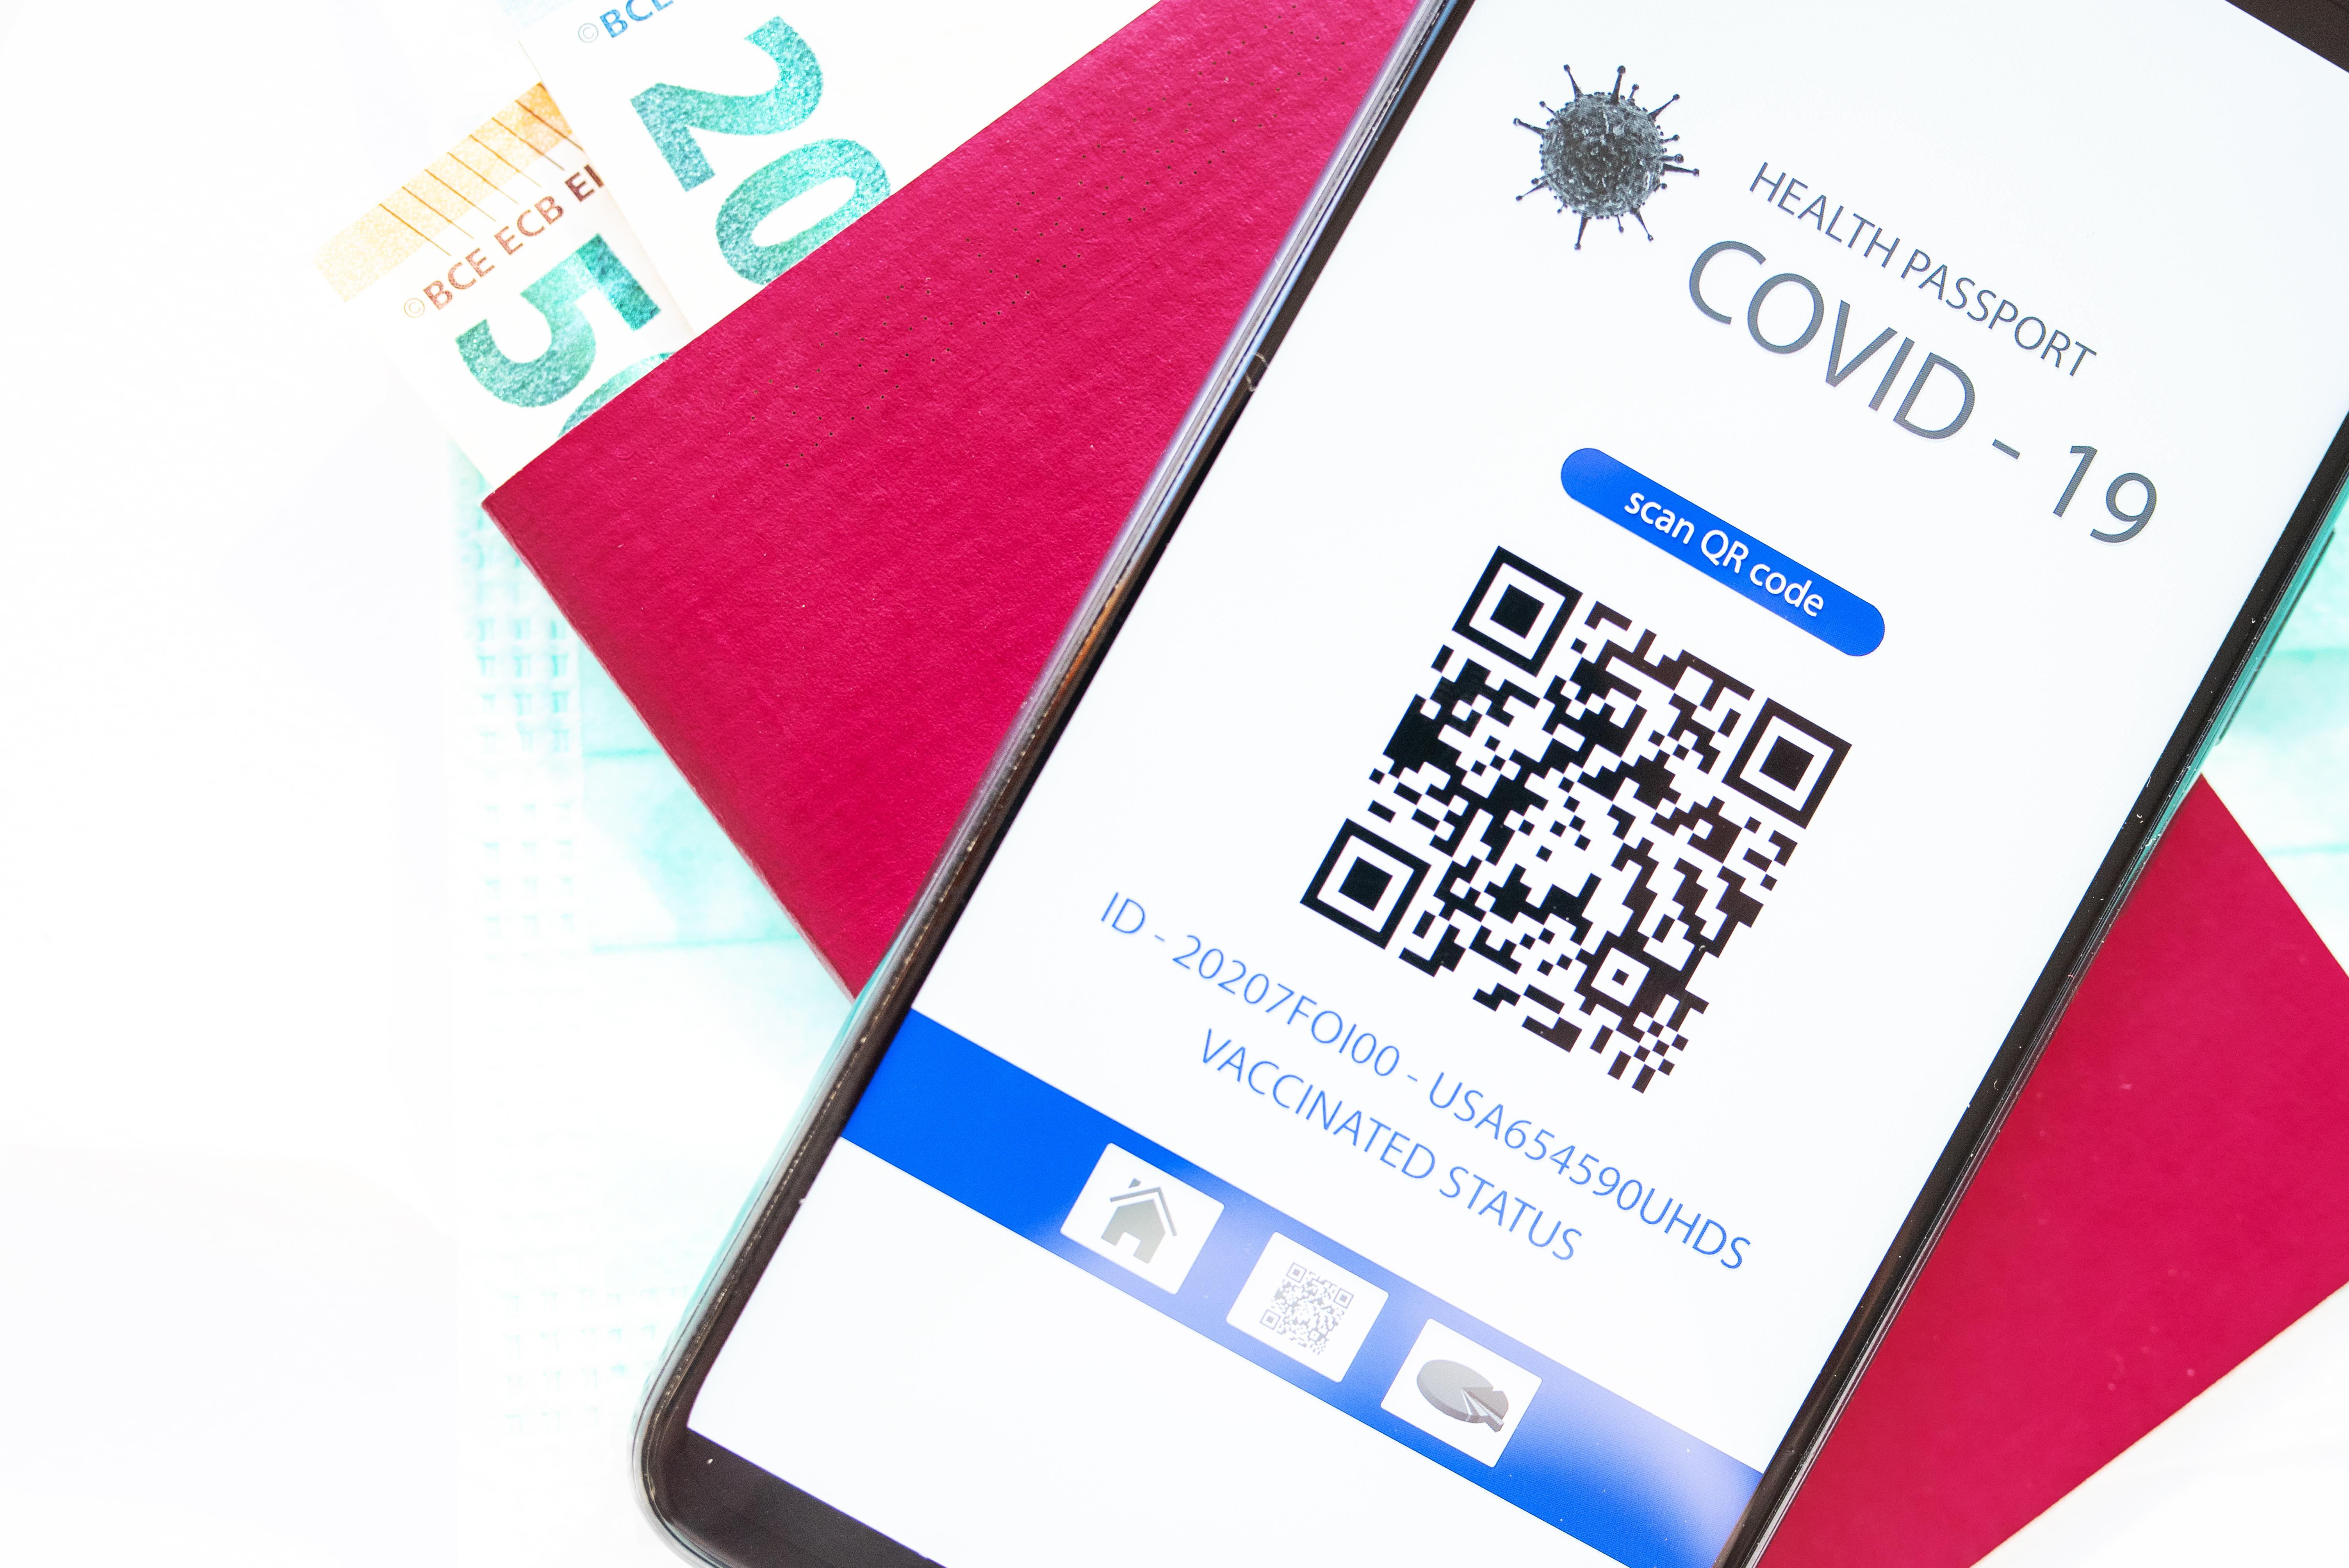 Visao Passaporte Digital De Vacinacao Covid Nao Pode Haver Cidadaos De Primeira E De Segunda